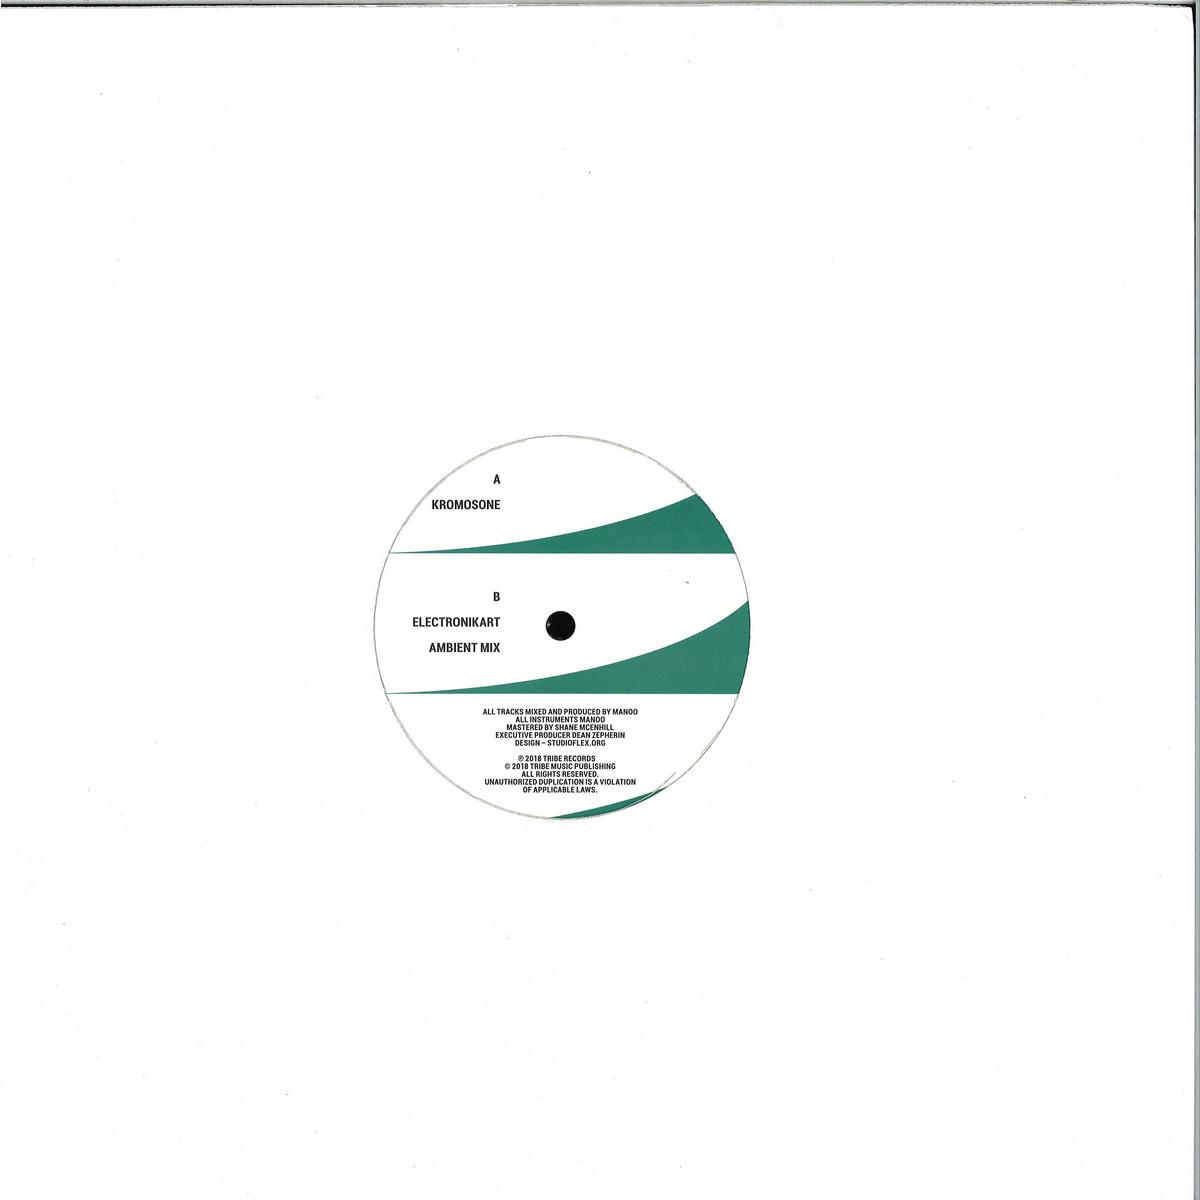 deejay de - TRIBE RECORDS